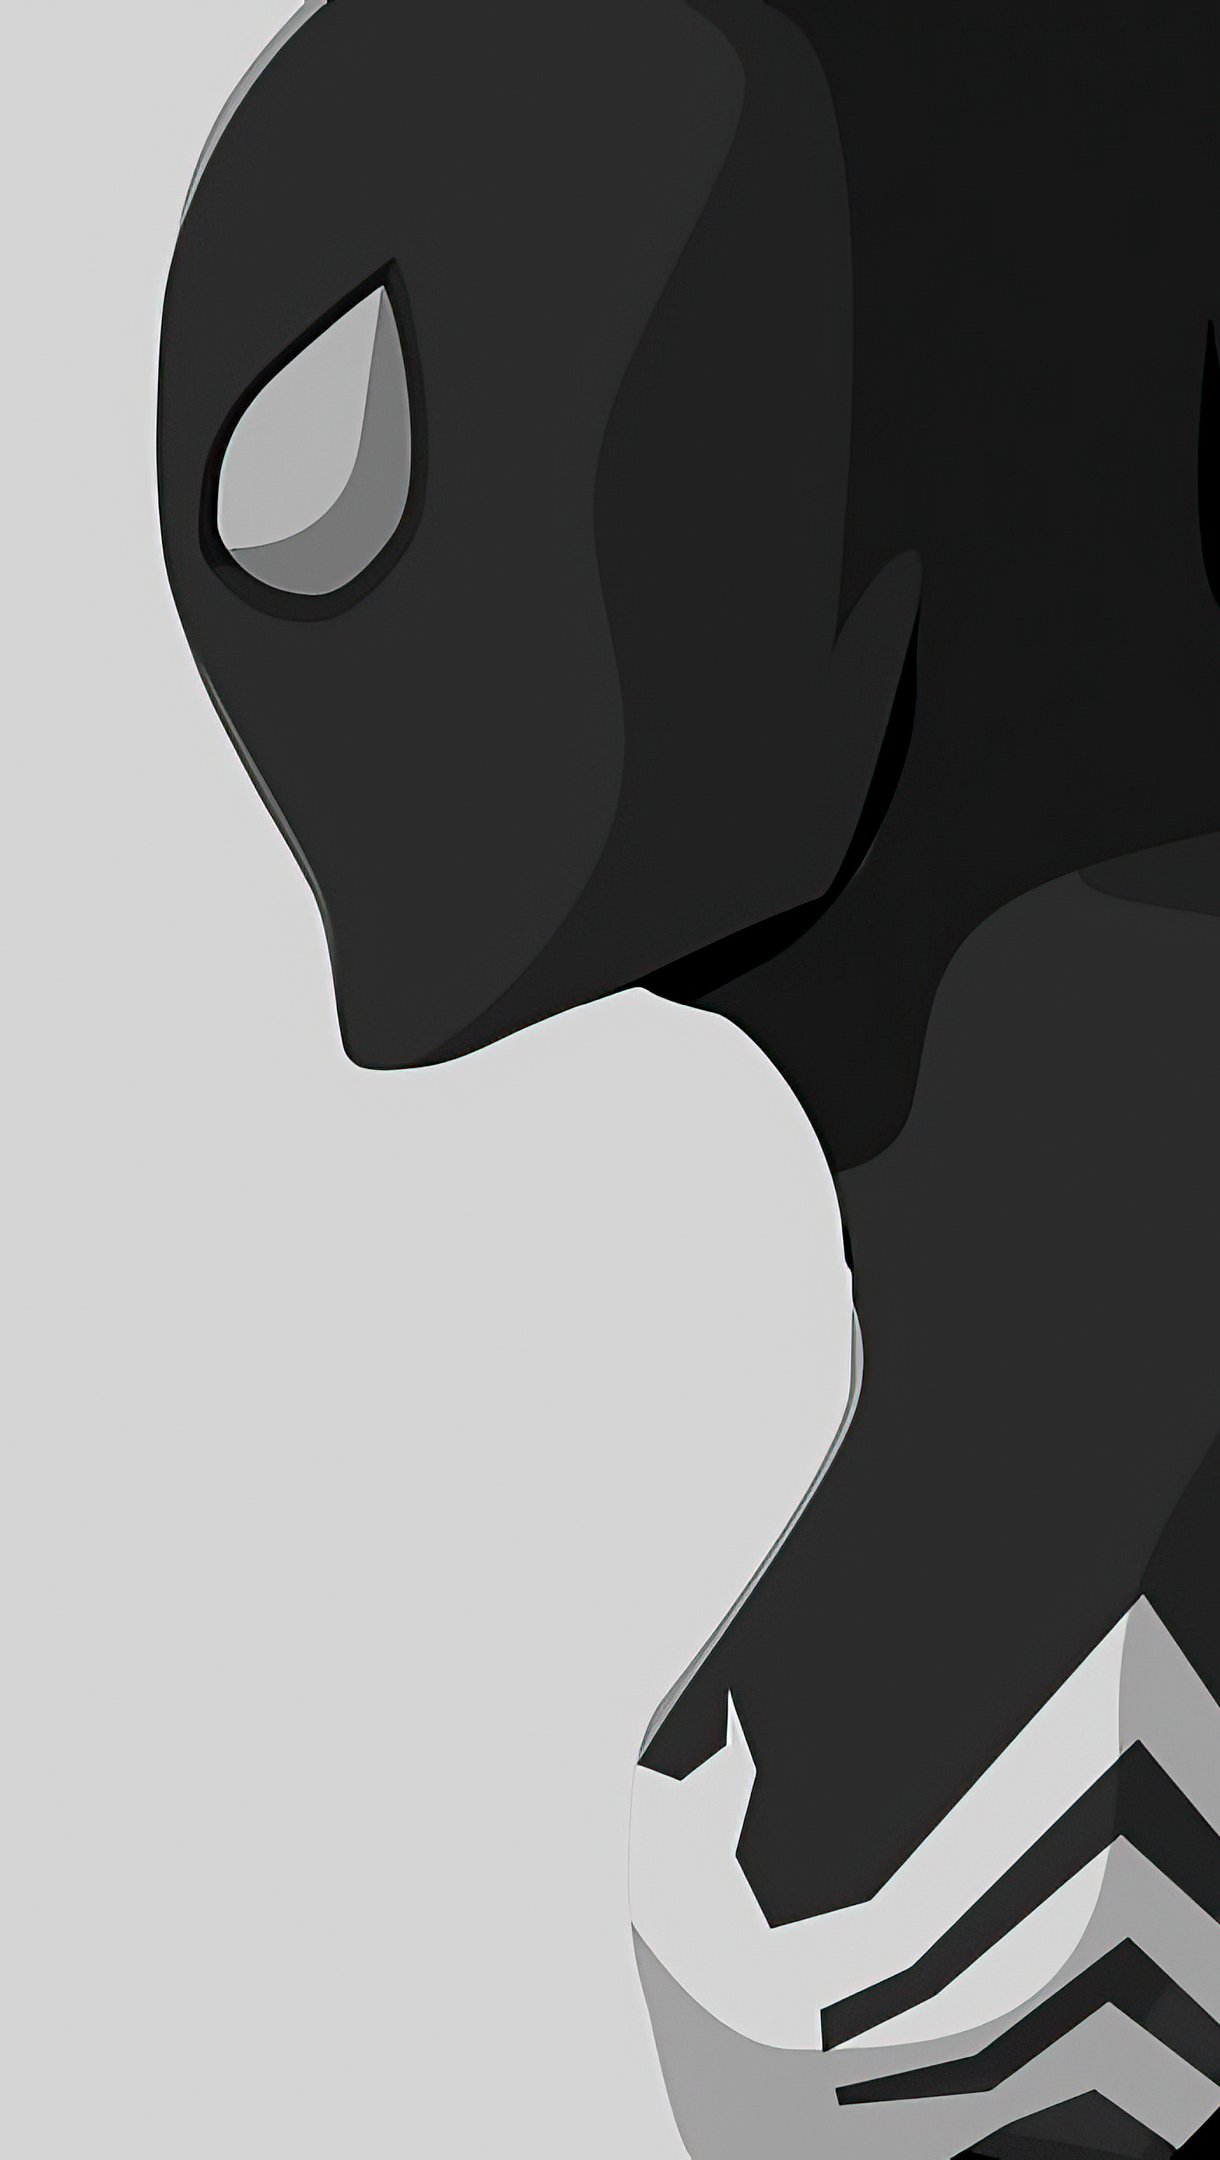 Wallpaper Black Spiderman minimalist style Vertical